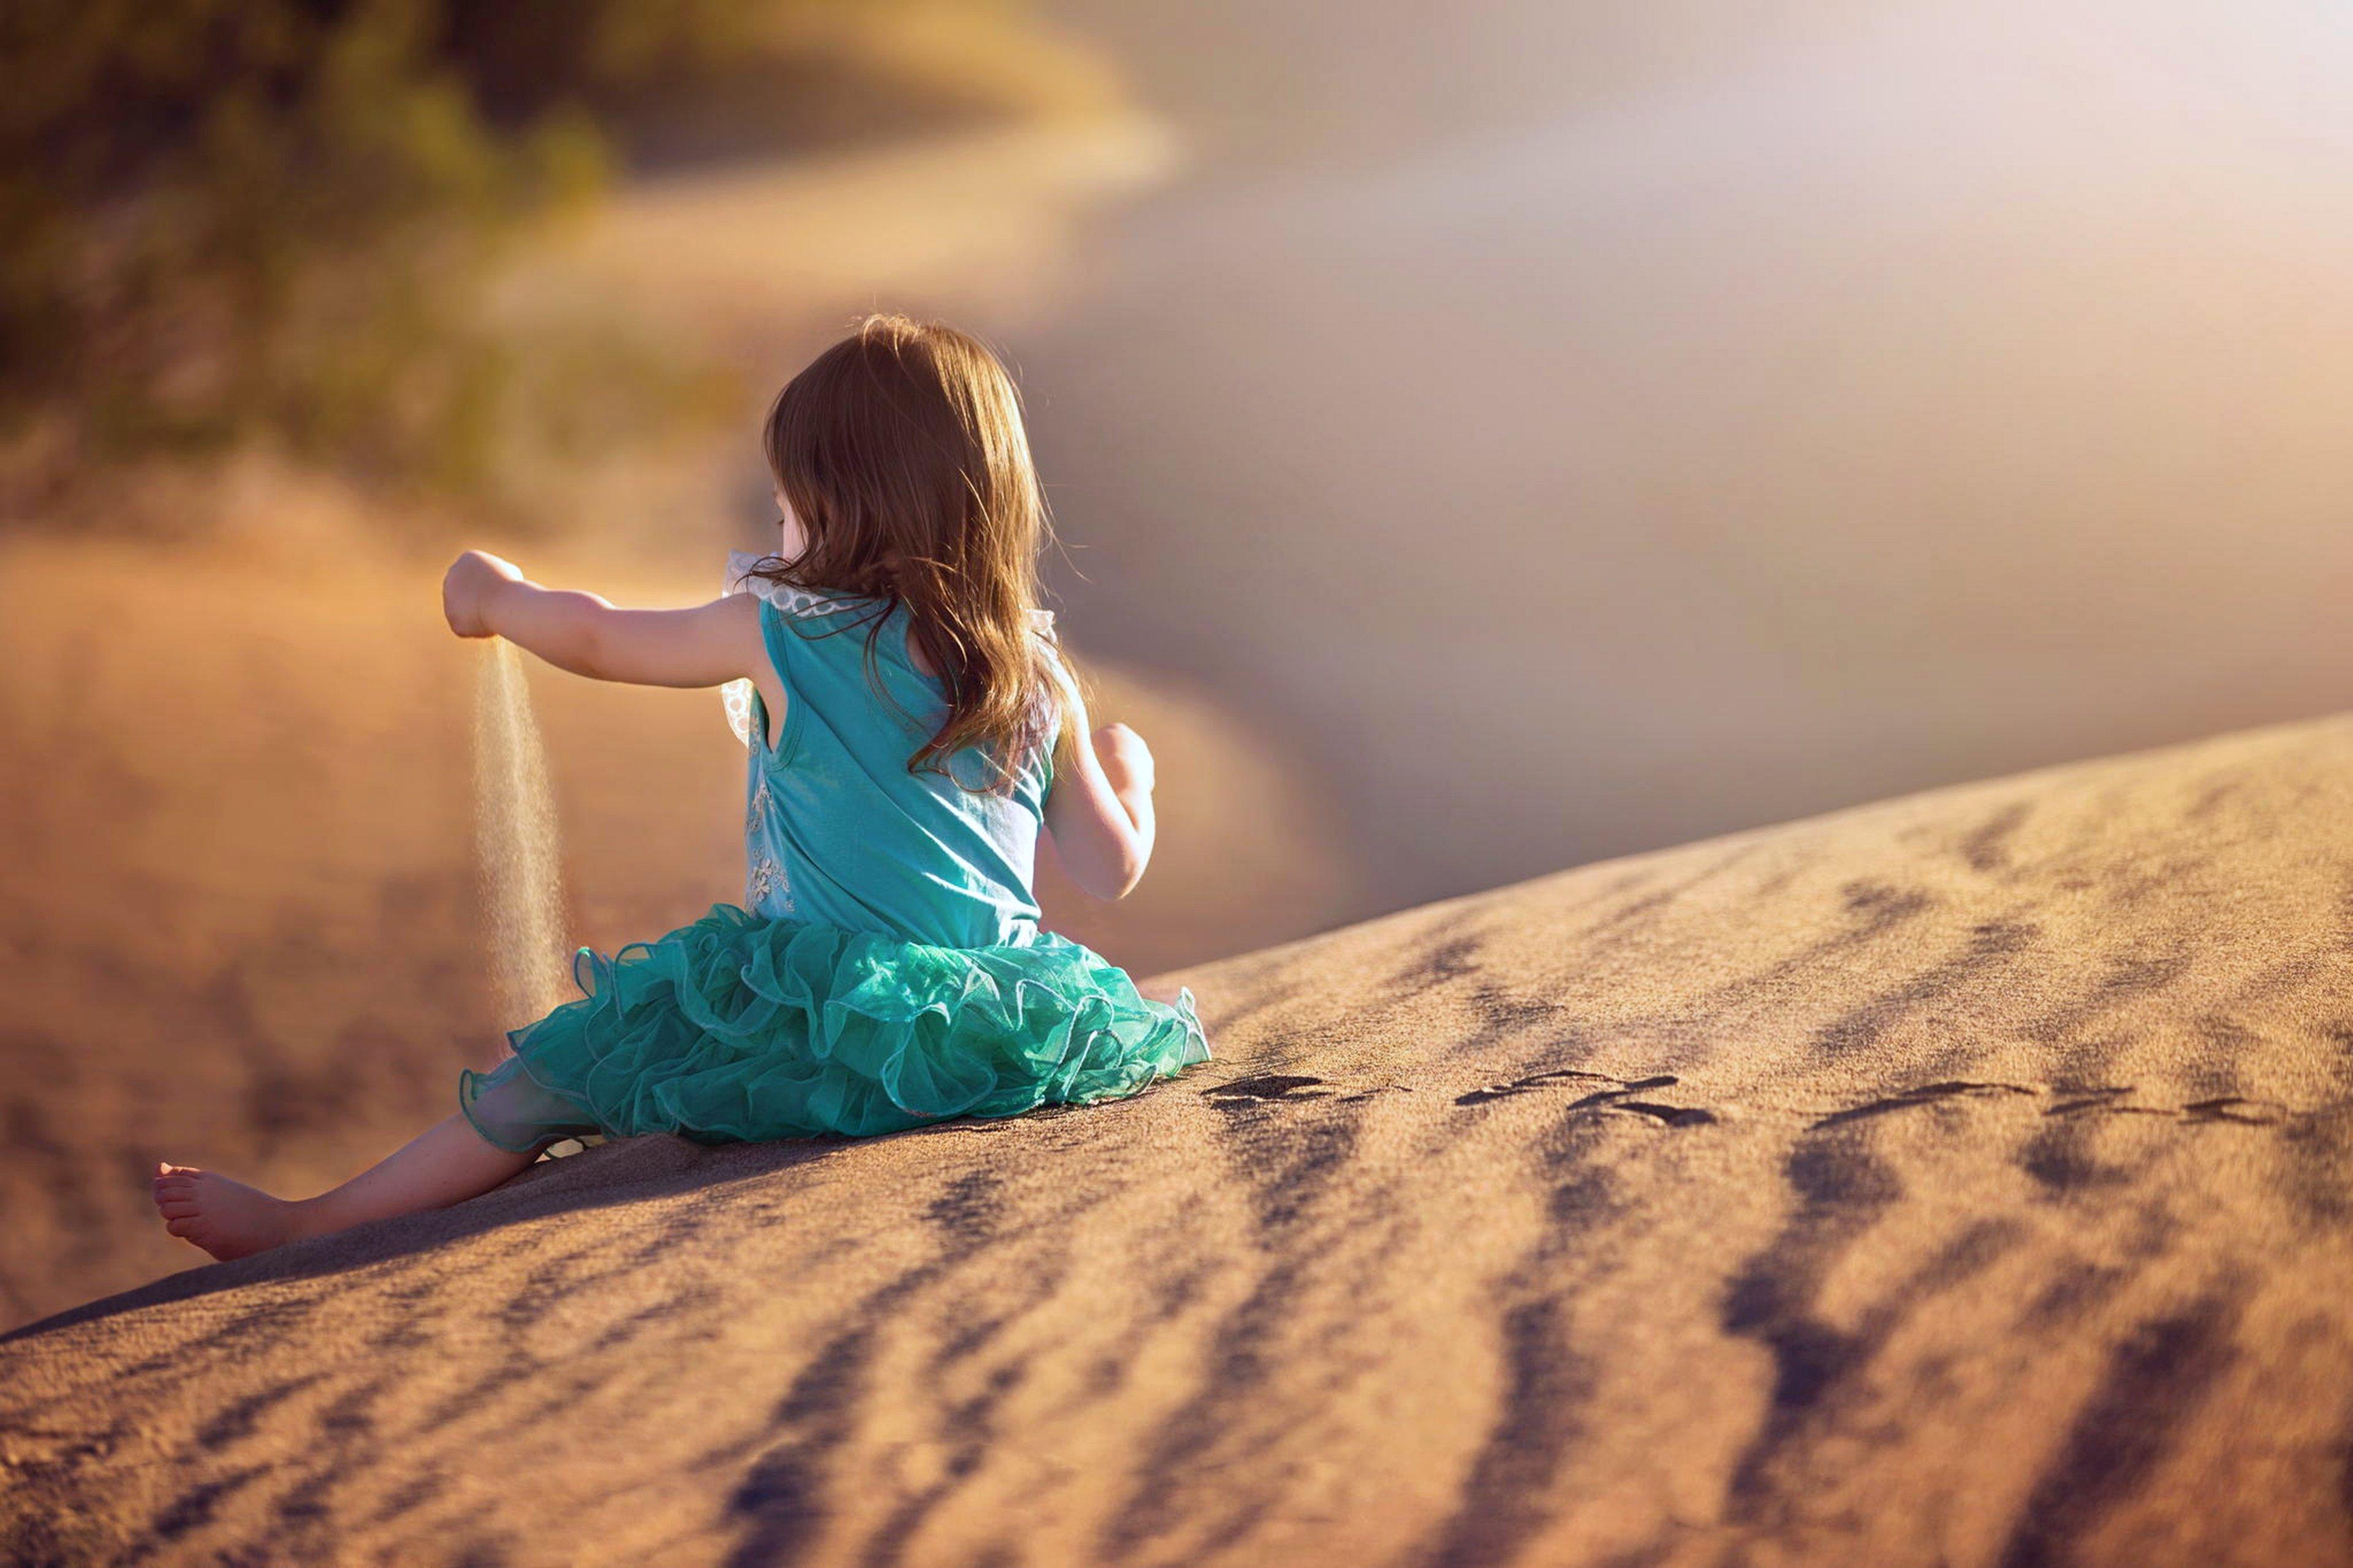 Sand Little Girl Desert Kids Happy Play Joy Funlandscapes Nature Princess Wallpaper